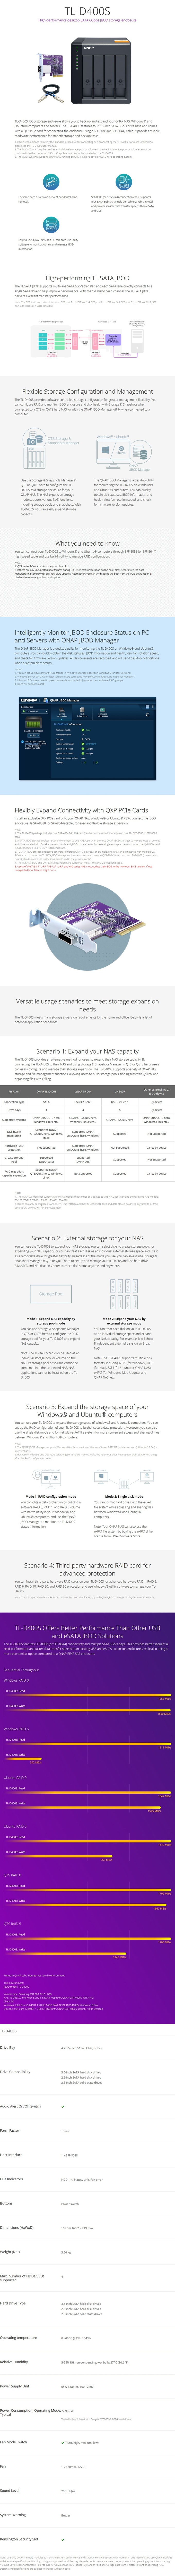 qnap-tld400s-desktop-jbod-sata-storage-expansion-enclosure-ac40475-3.jpg